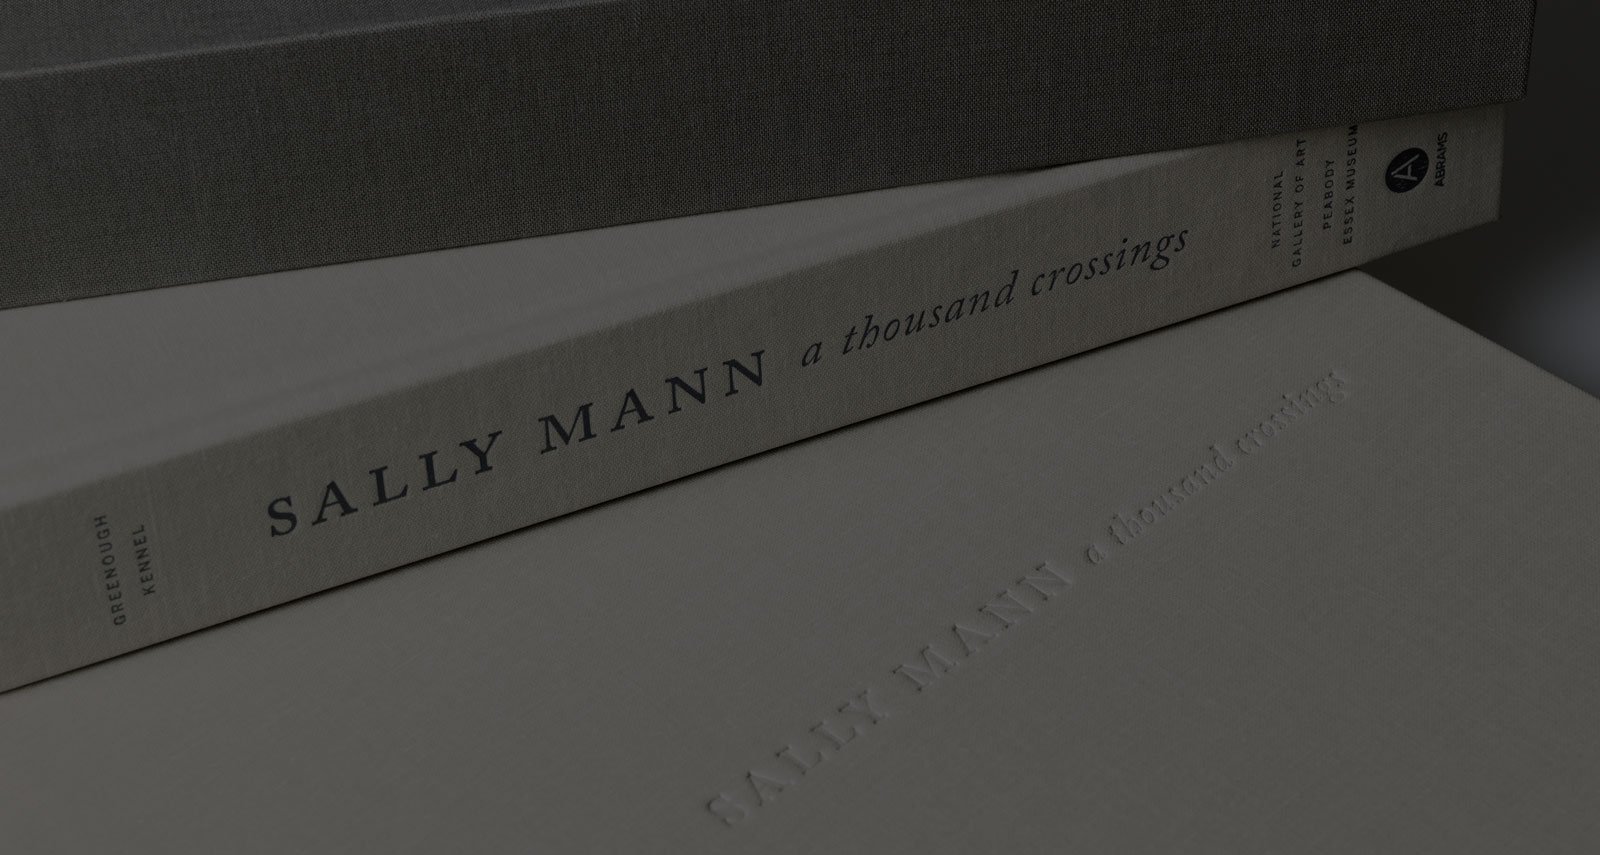 Sally Mann&#8217;s <em>A Thousand Crossings</em>